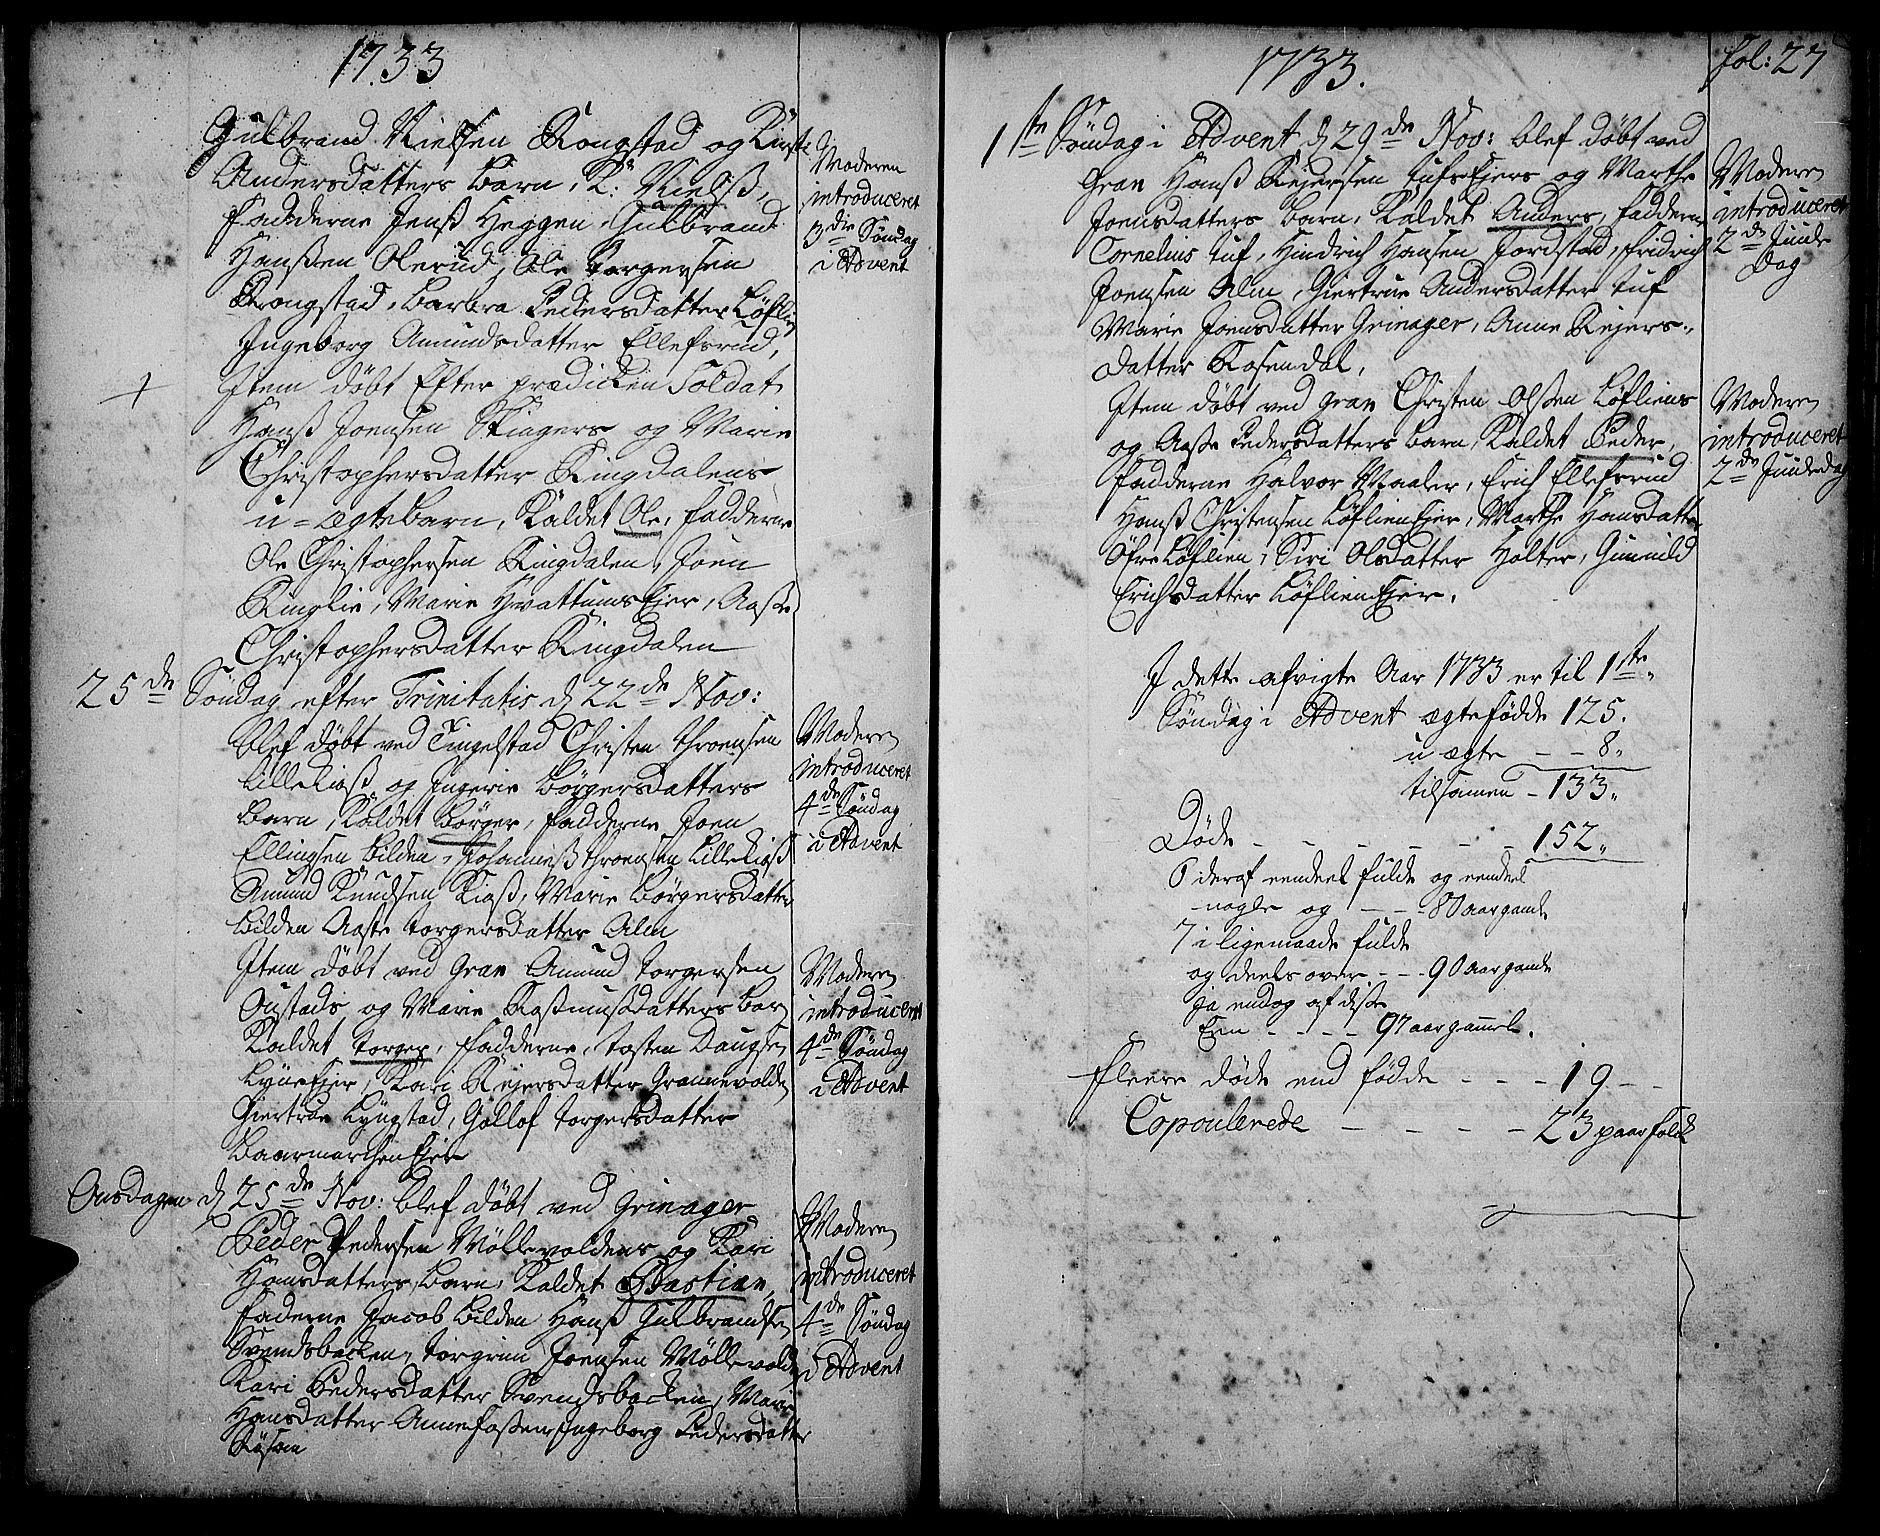 SAH, Gran prestekontor, Ministerialbok nr. 2, 1732-1744, s. 27